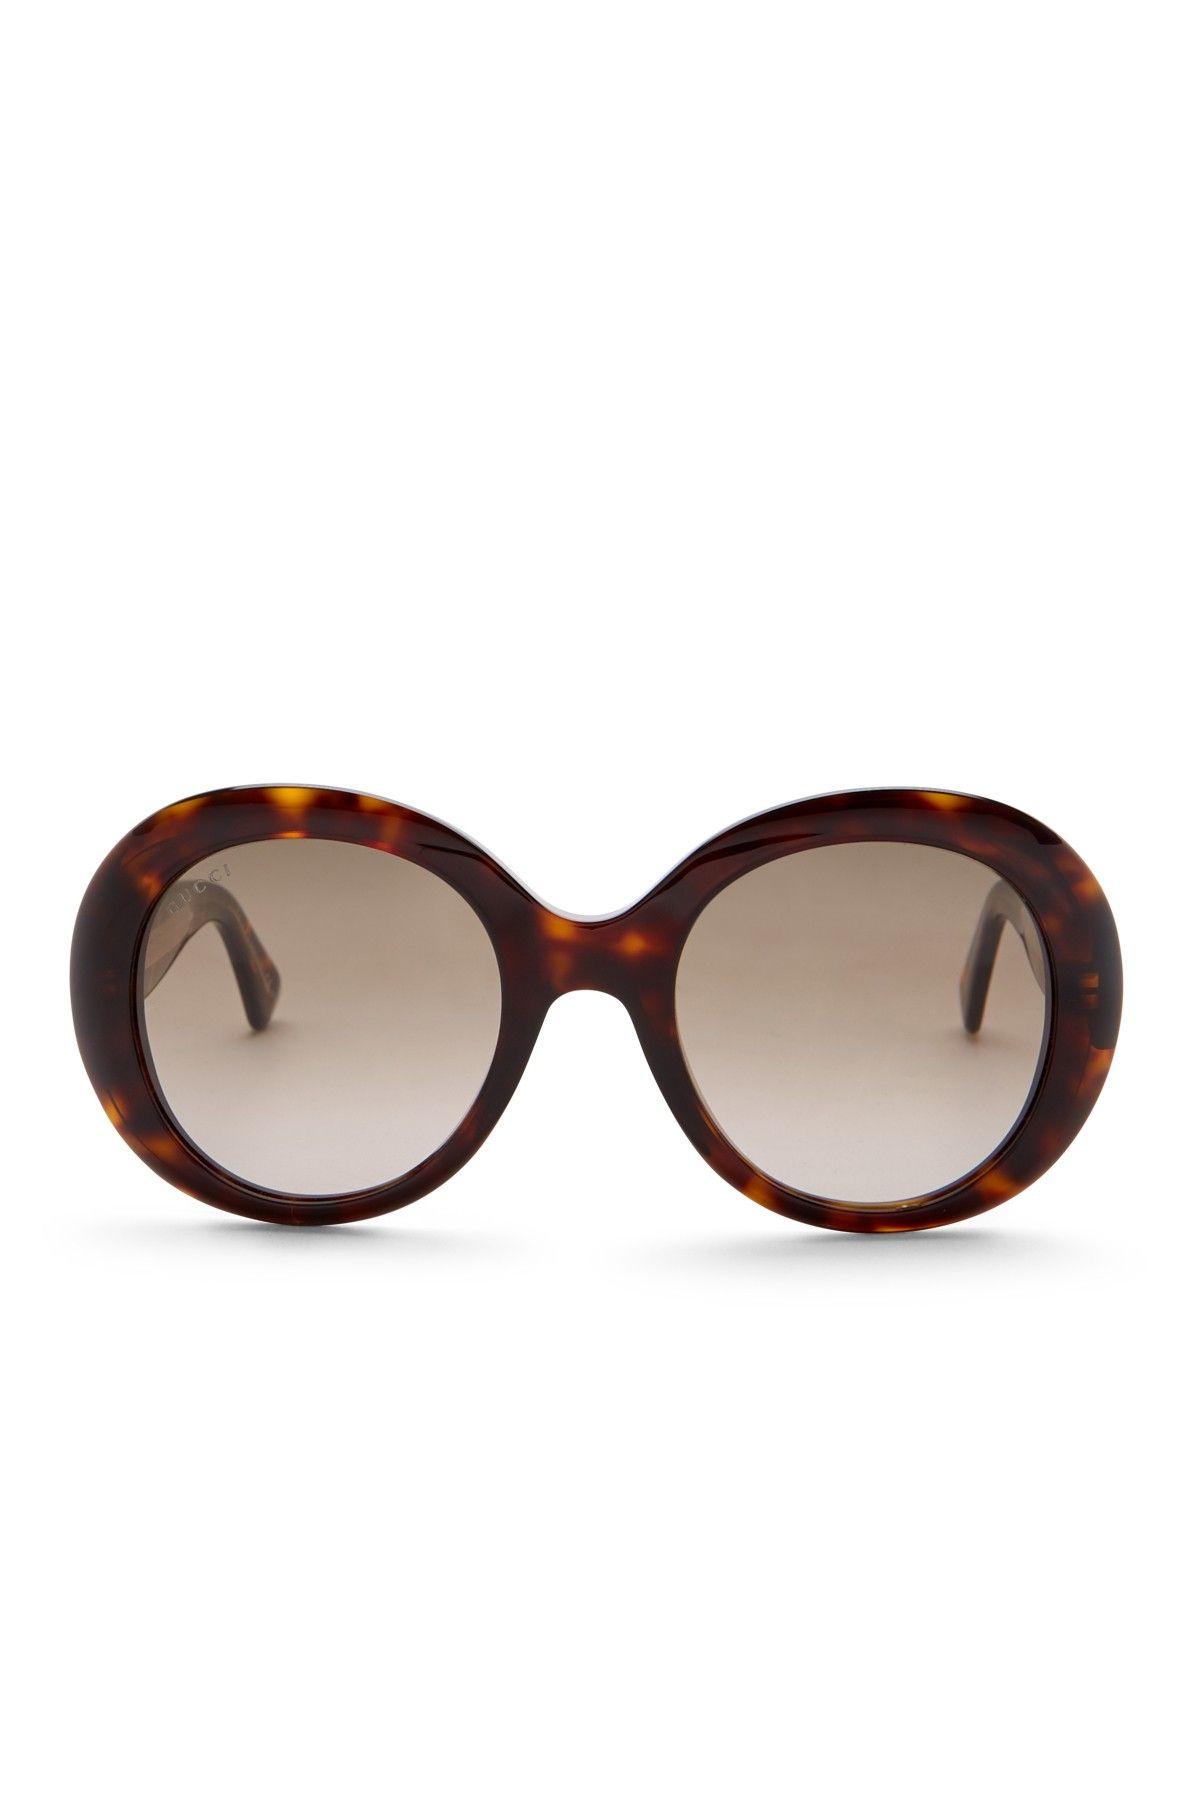 4ceeb21a04e42 Women s Round Acetate Frame Sunglasses